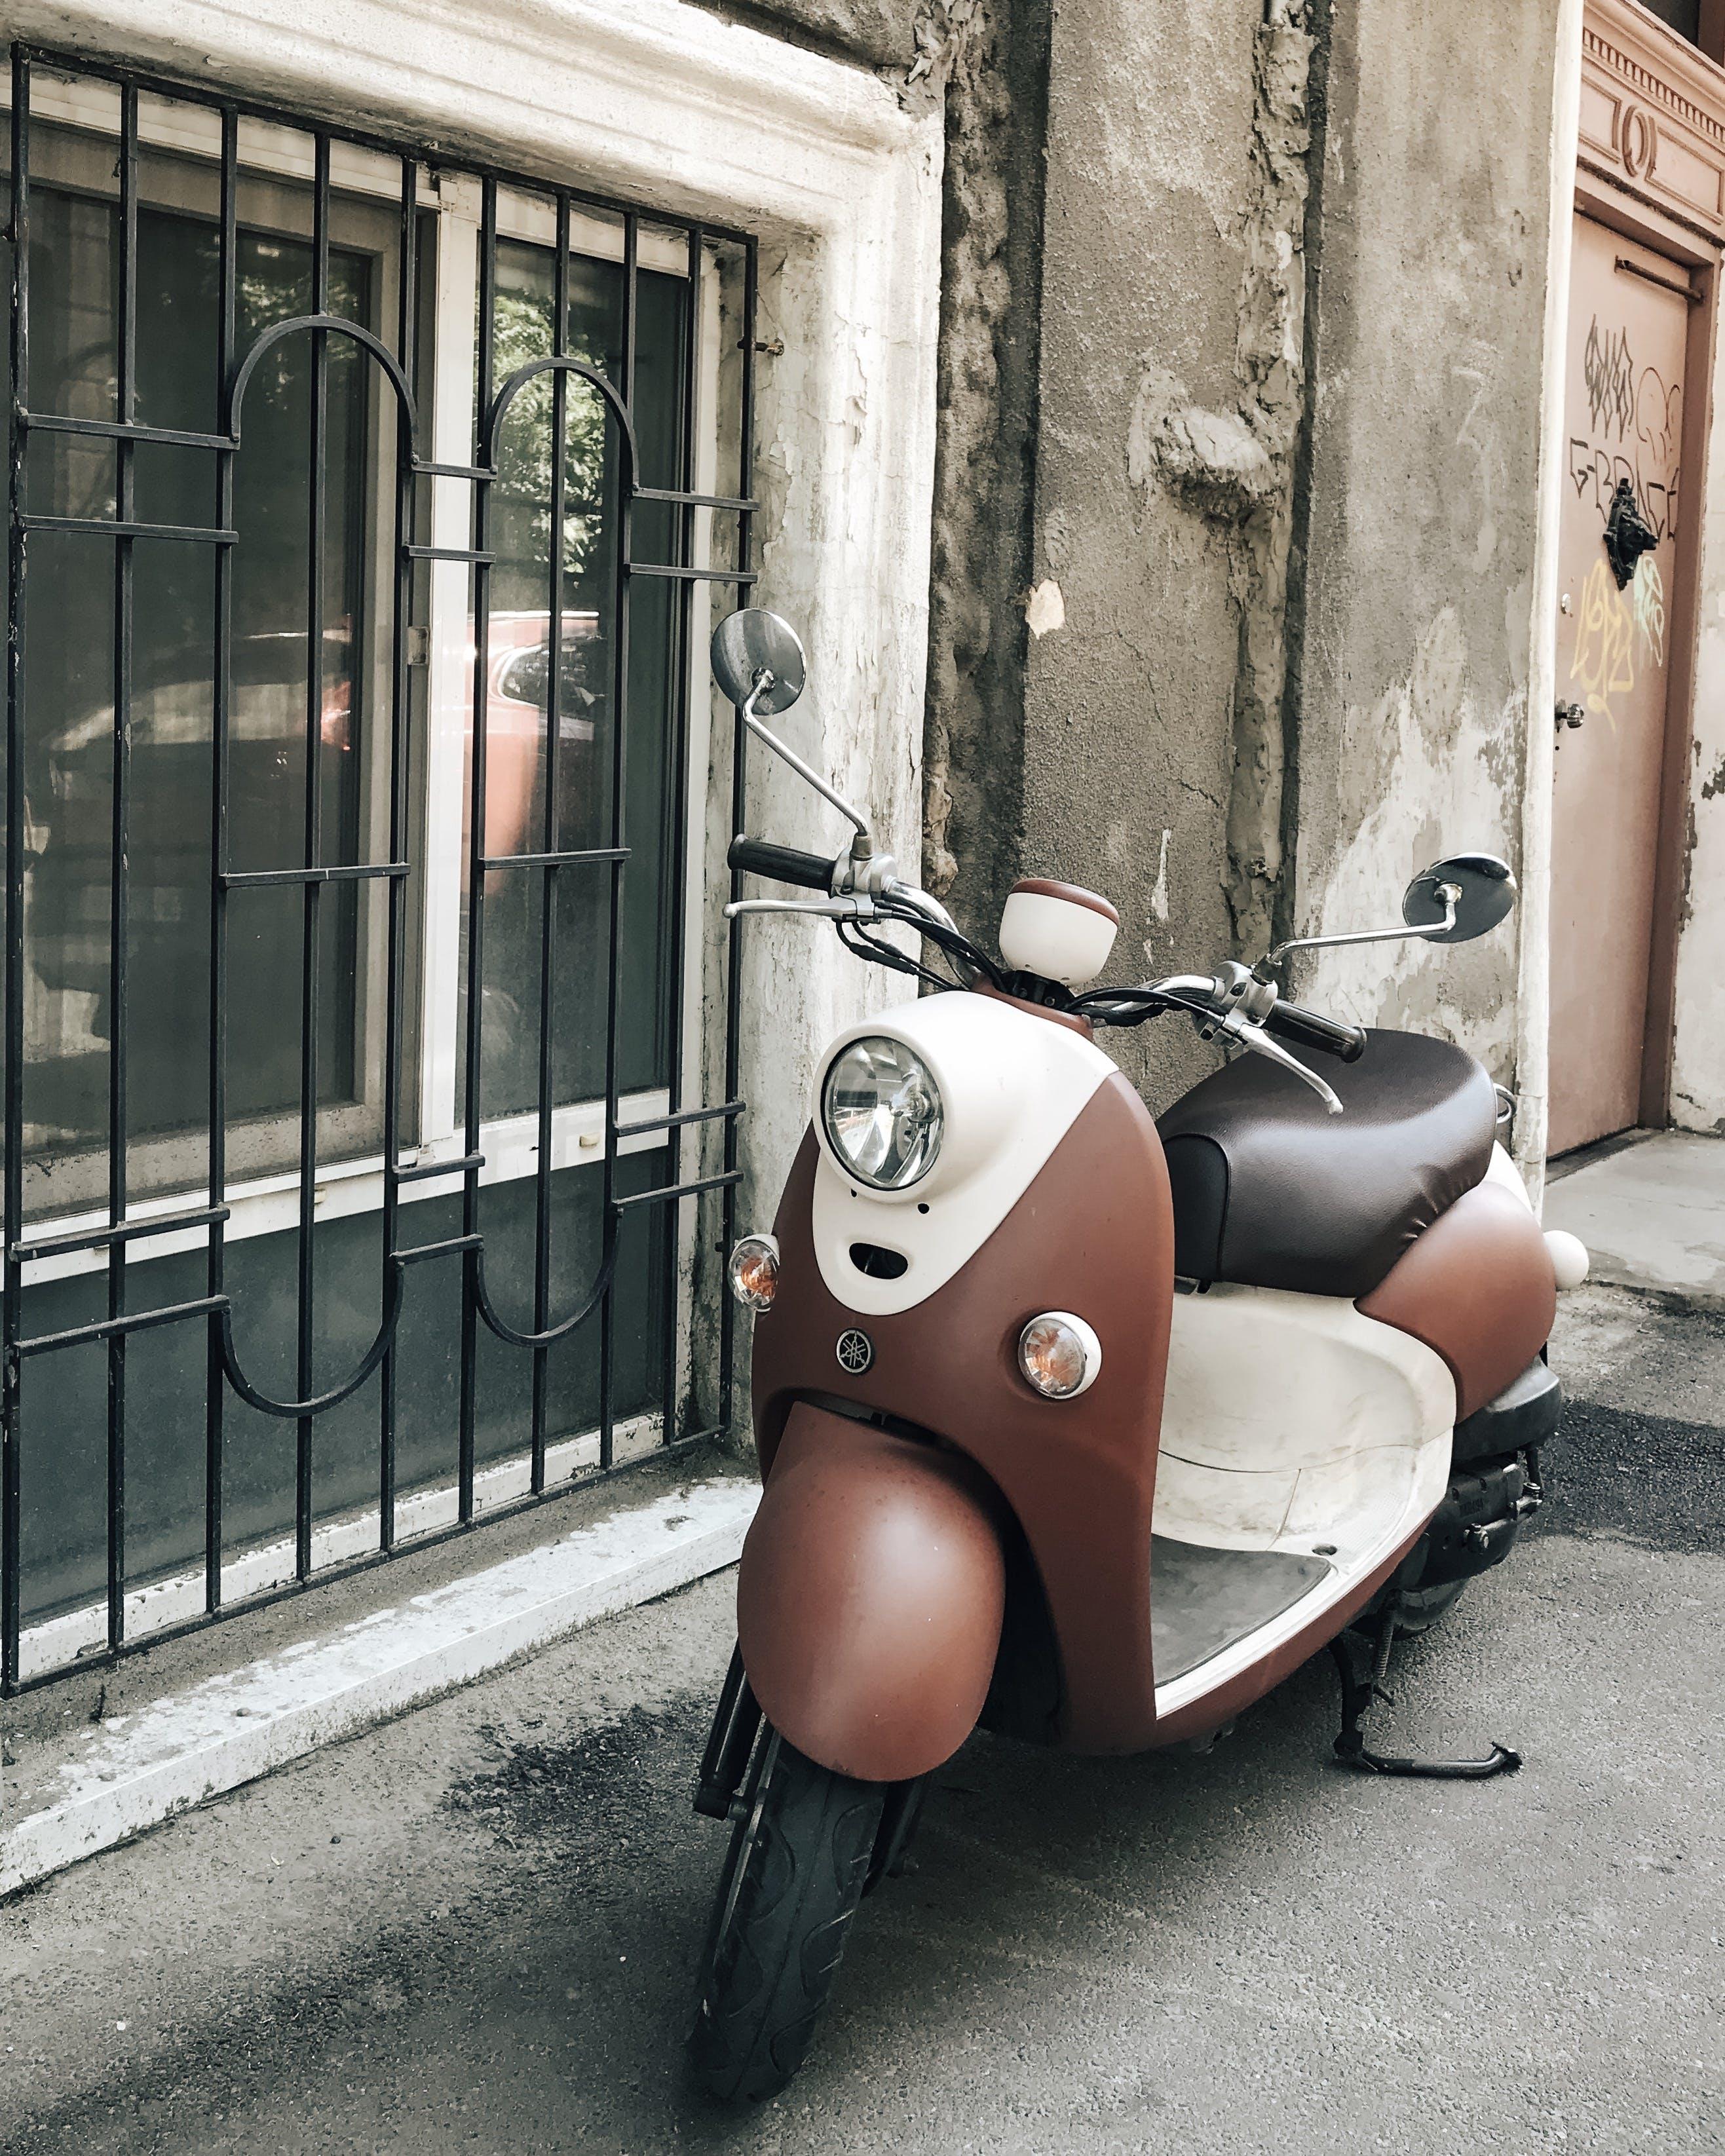 duvar, motosiklet, park etmiş, vespa içeren Ücretsiz stok fotoğraf